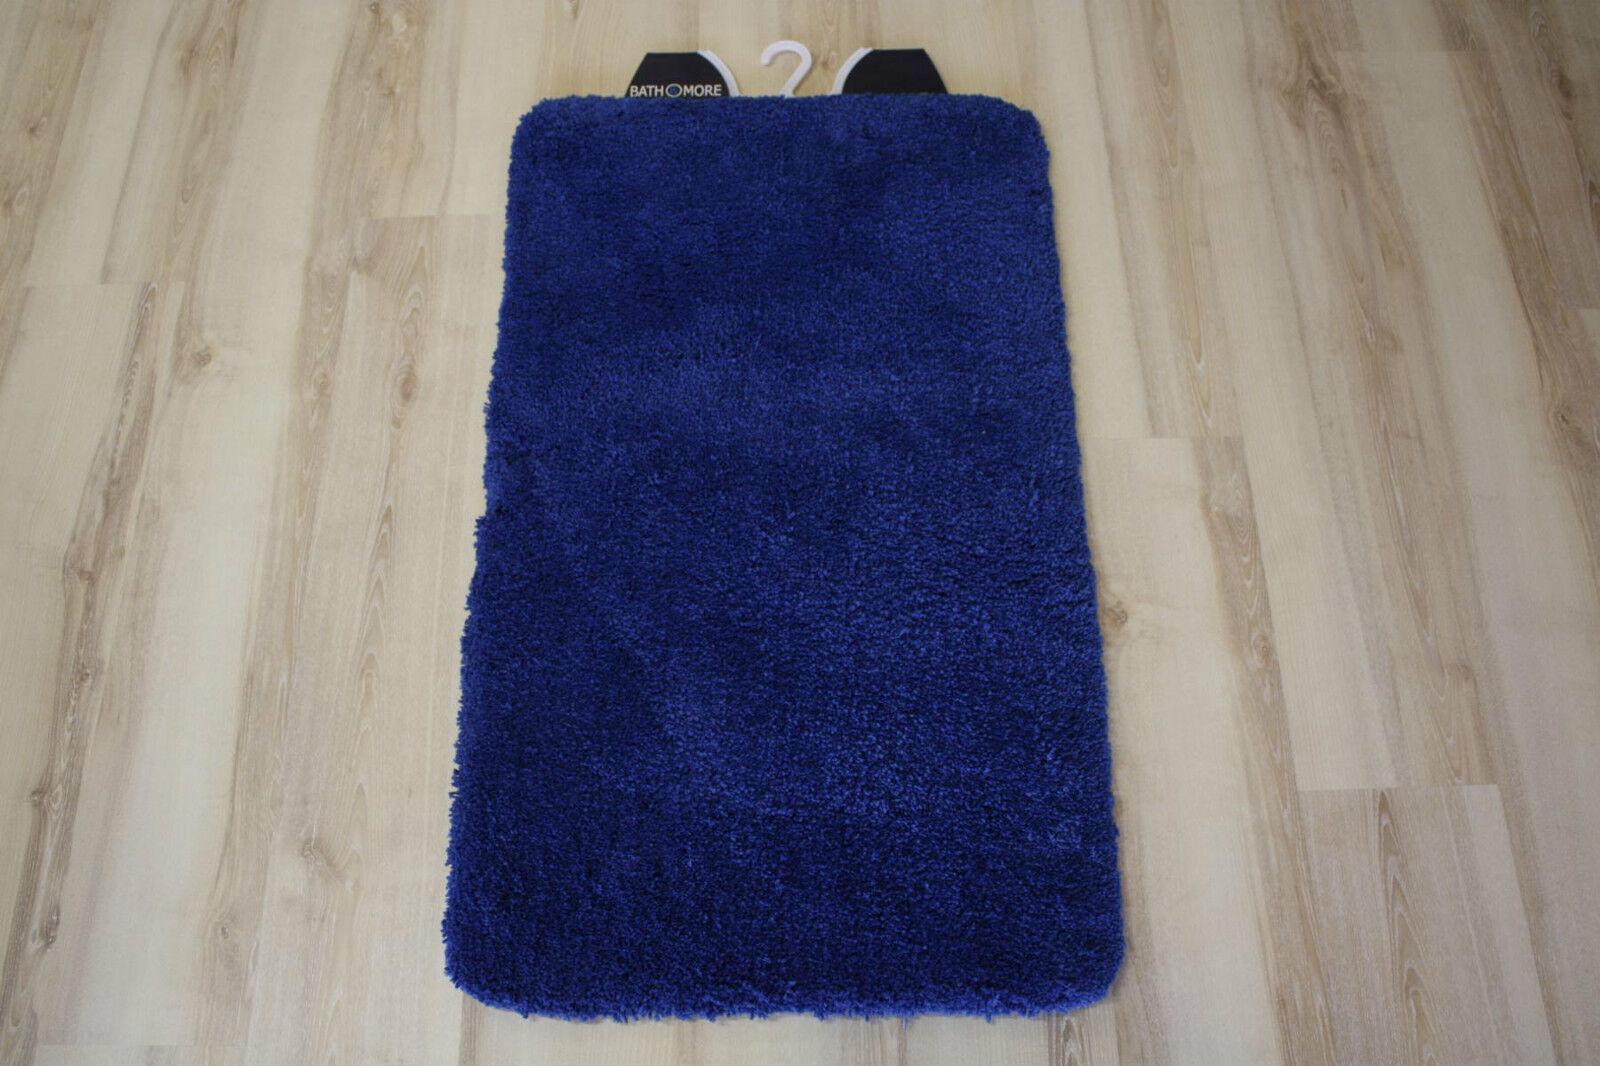 Tapis de Bain Bleu Uni 80x150cm Souple